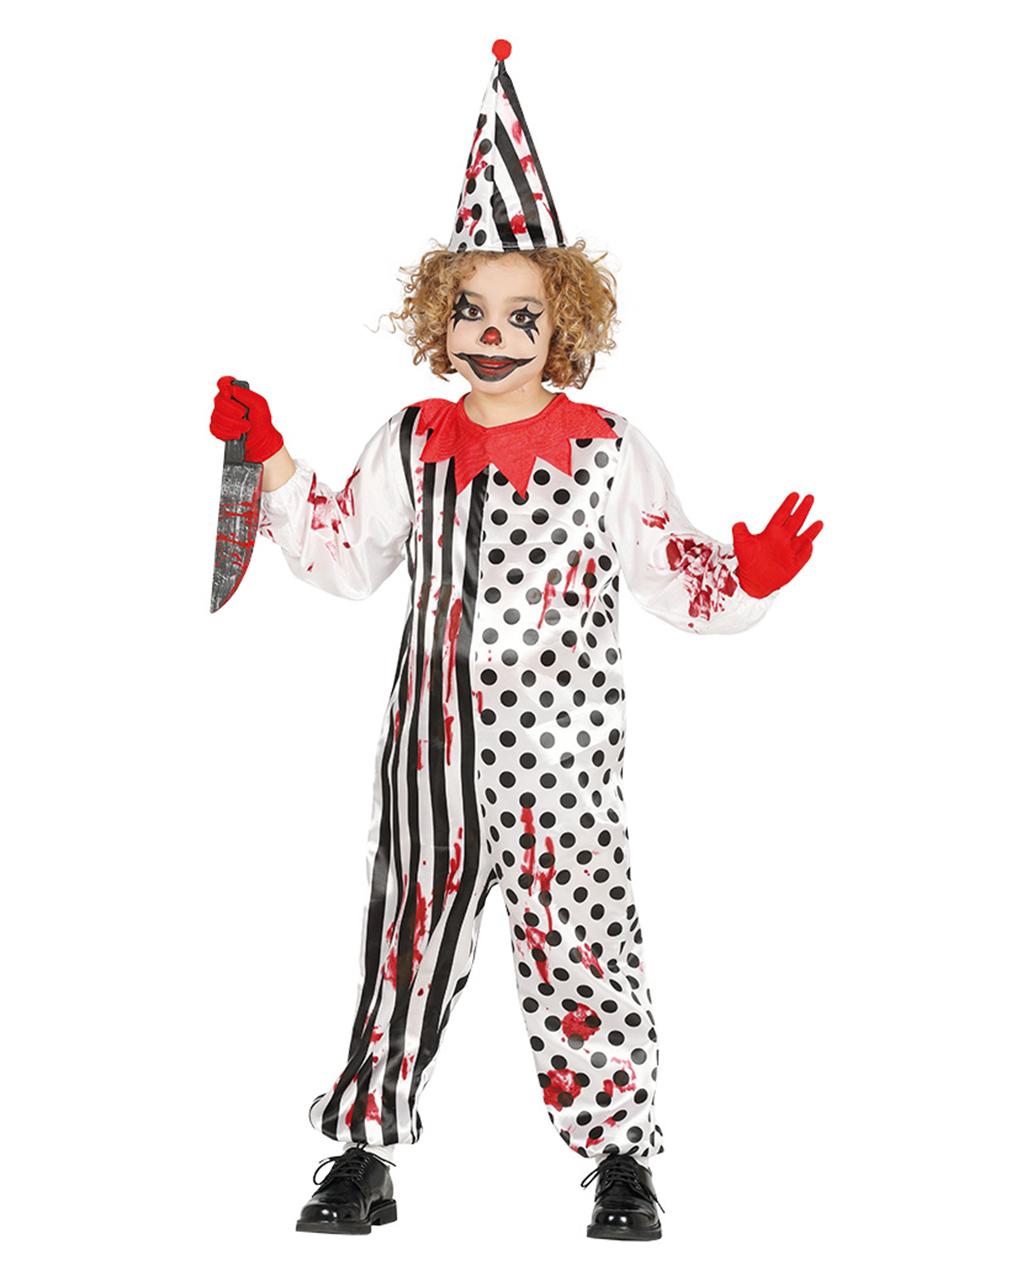 killer clown kinderkost m f r halloween karneval universe. Black Bedroom Furniture Sets. Home Design Ideas